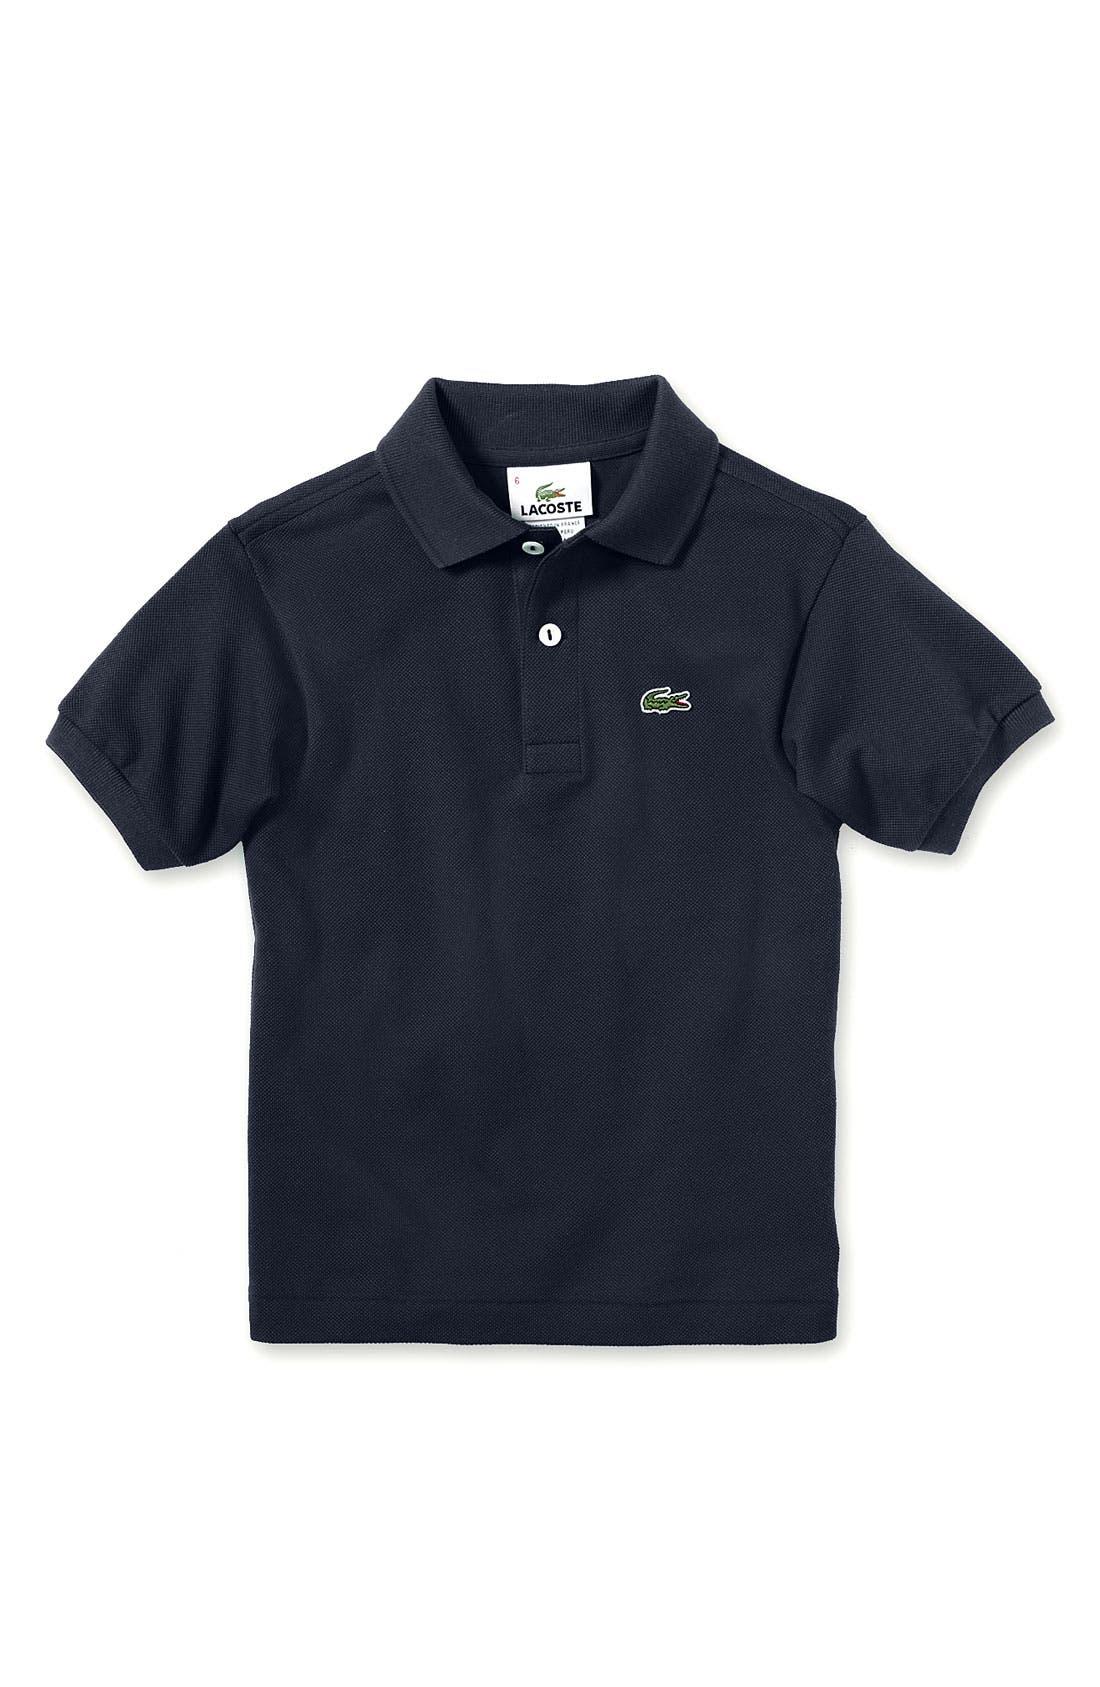 Main Image - Lacoste Short Sleeve Polo (Toddler Boys & Little Boys)